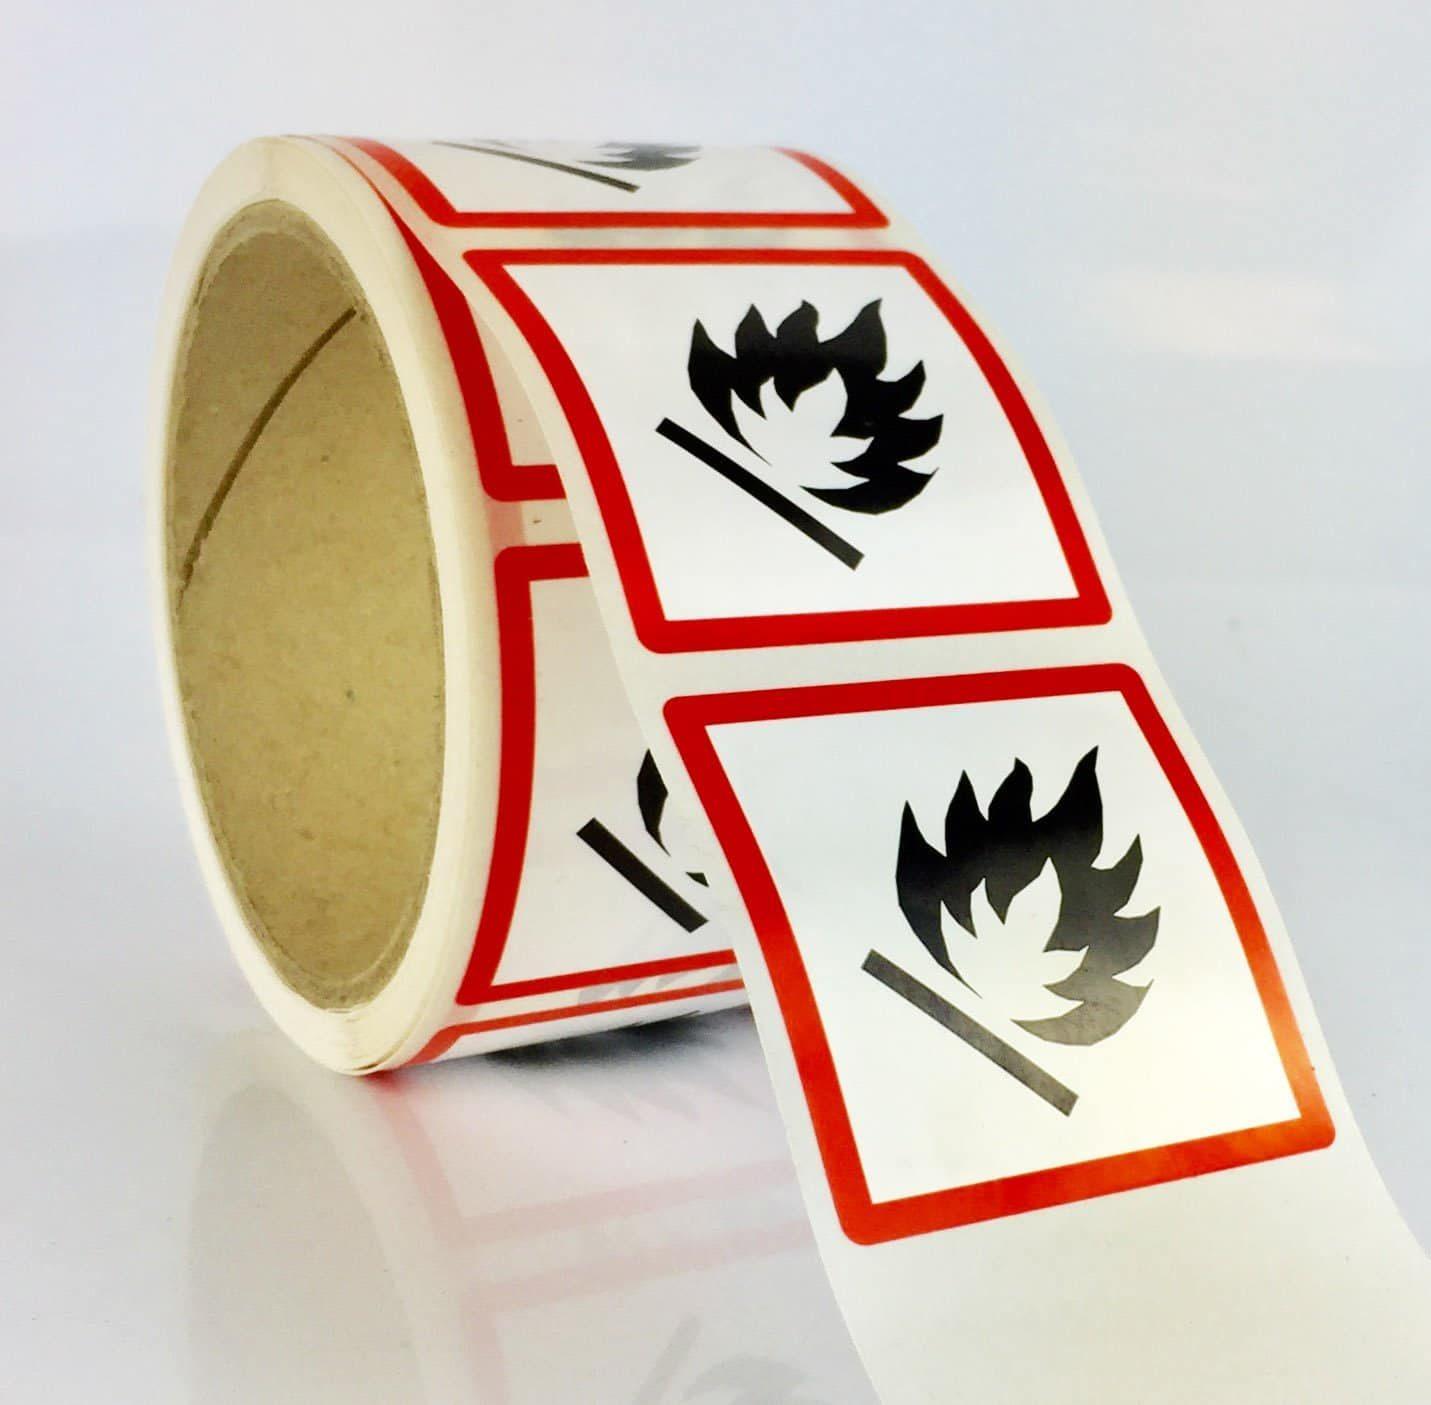 ghs02 labels flammable ghs labels